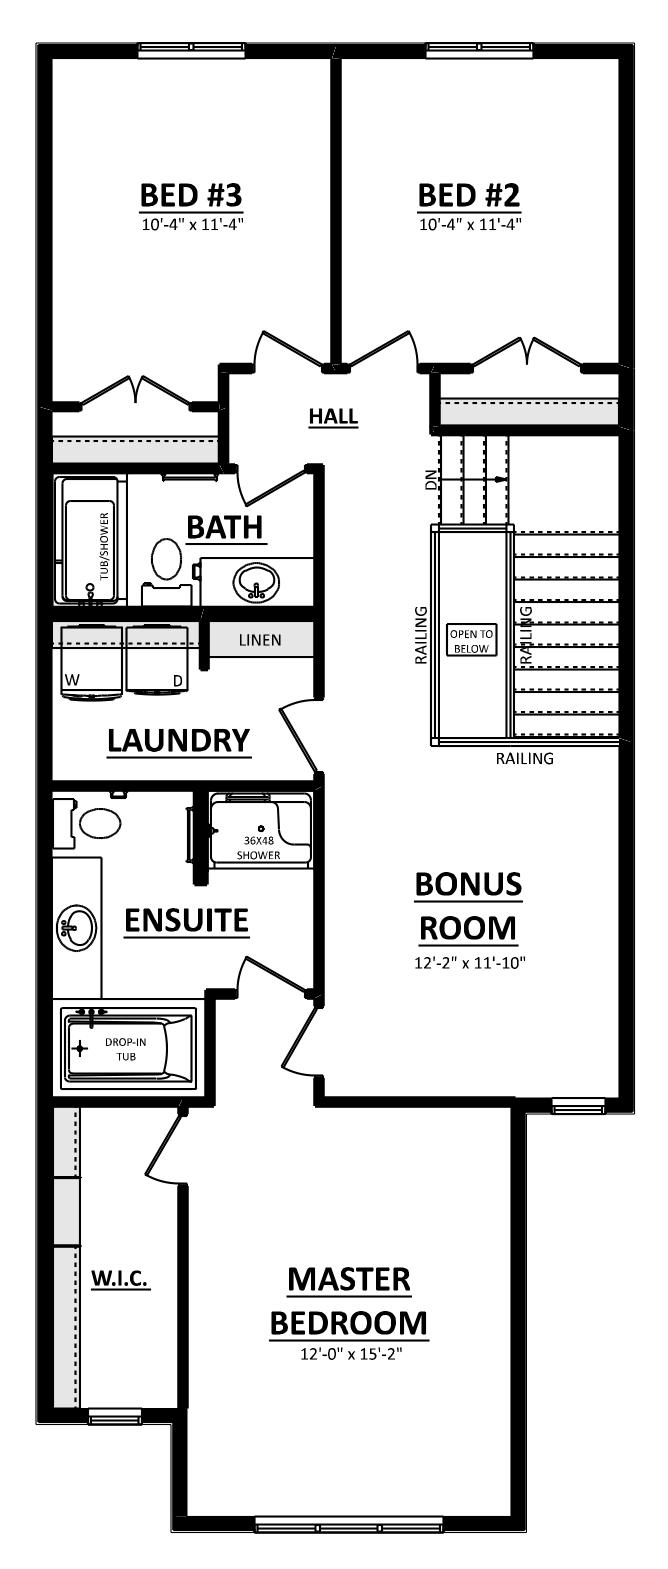 Durnin Second Floor Image